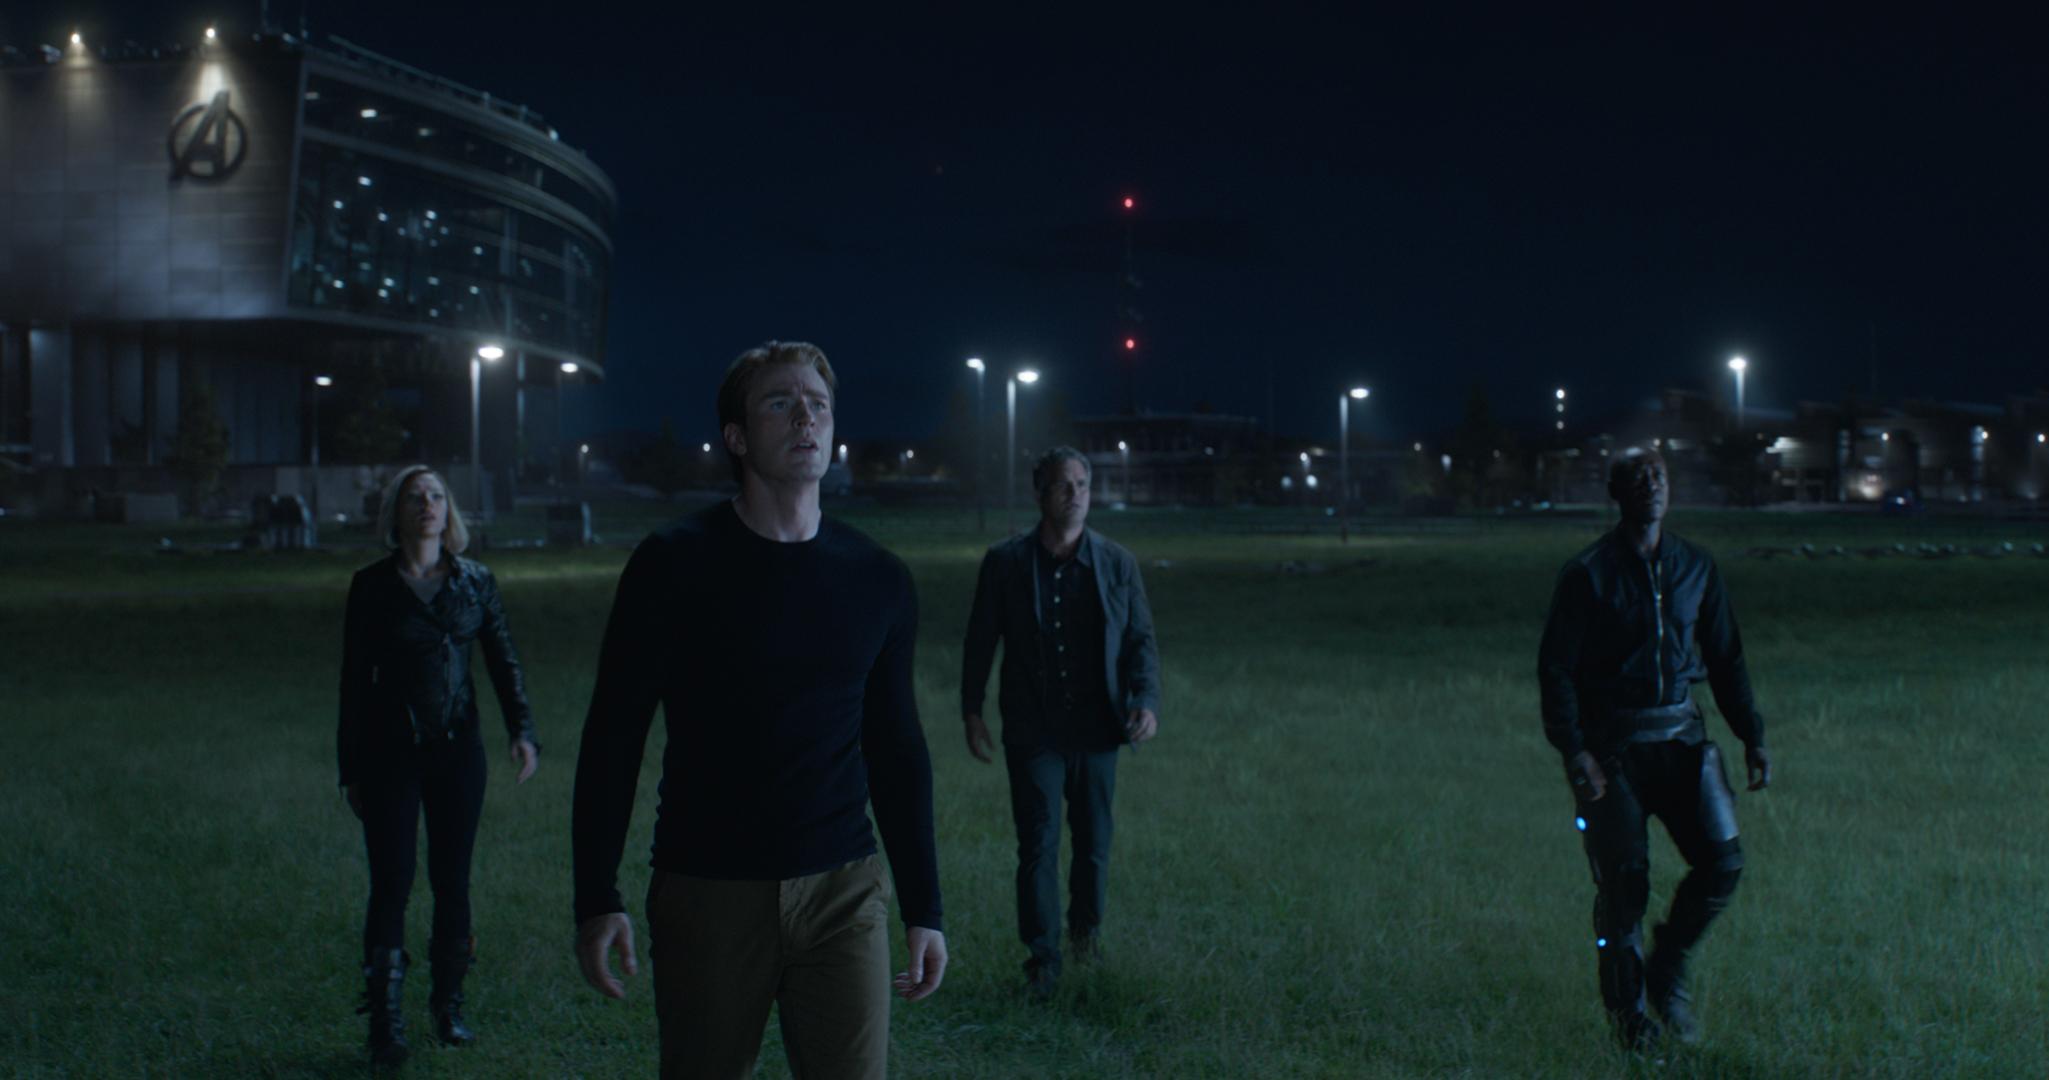 Avengers Endgame Tamil Voice Cast - Gambleh b